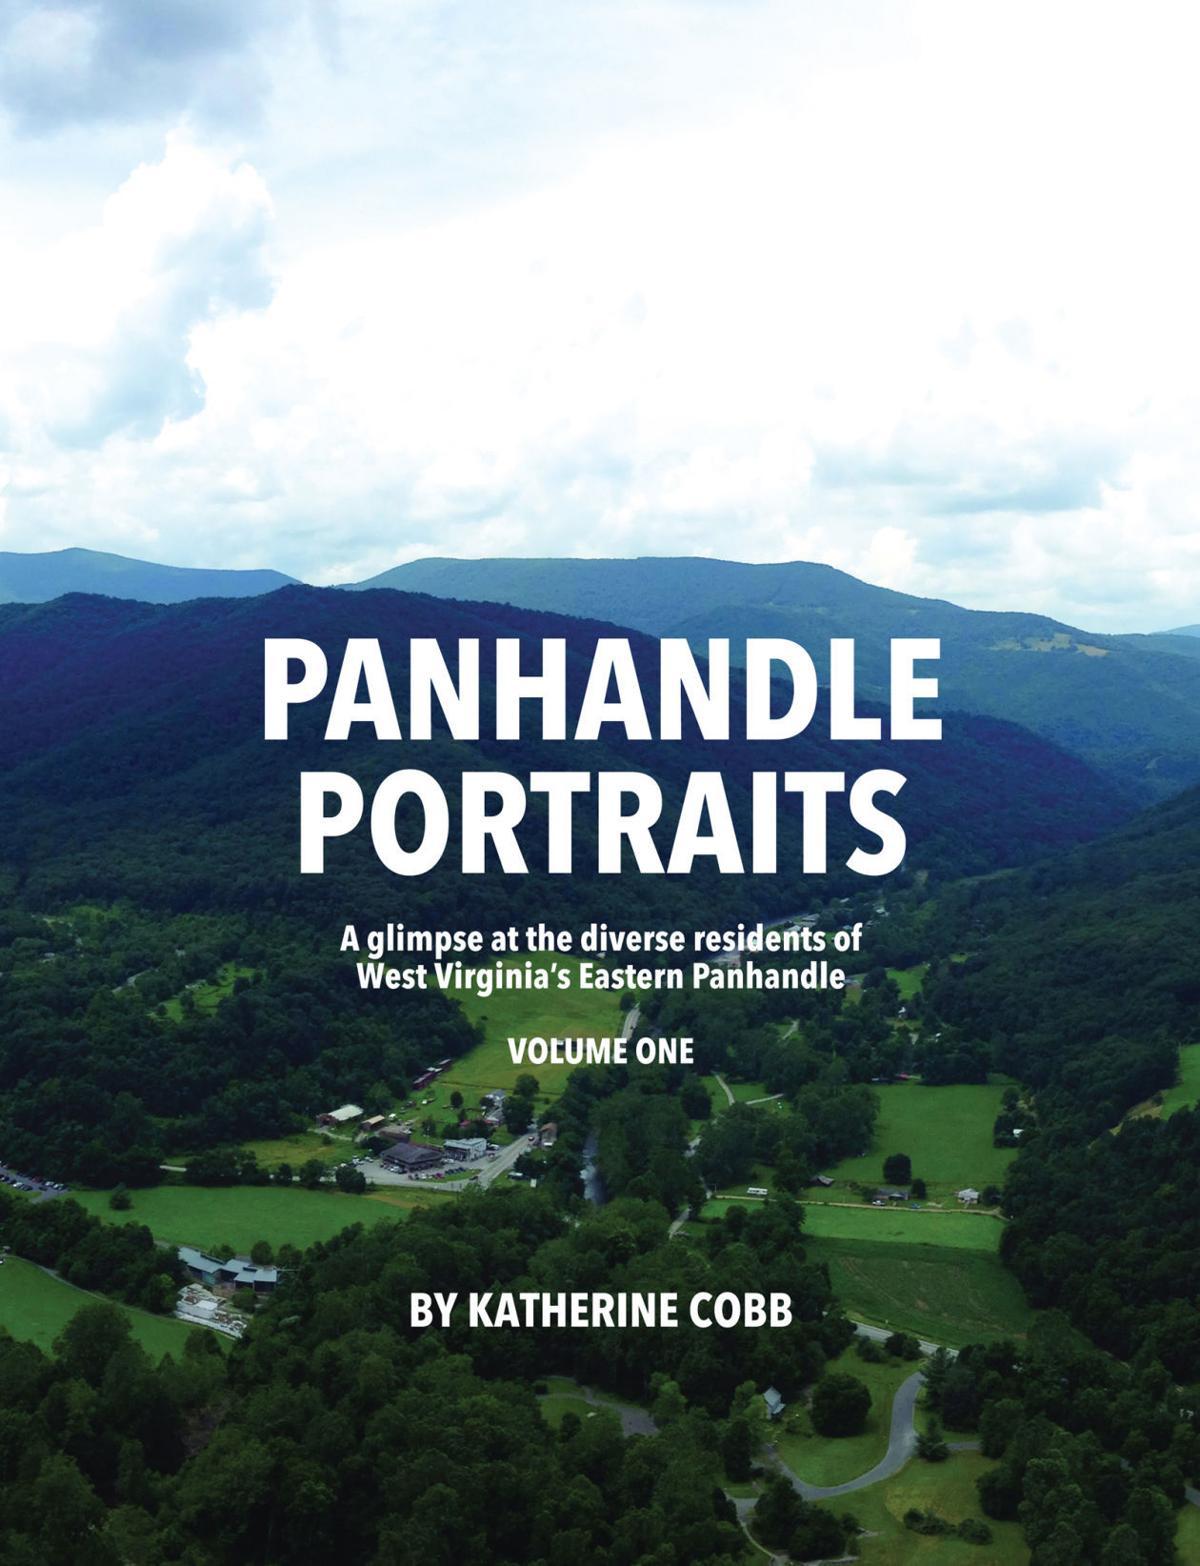 Panhandle portraits